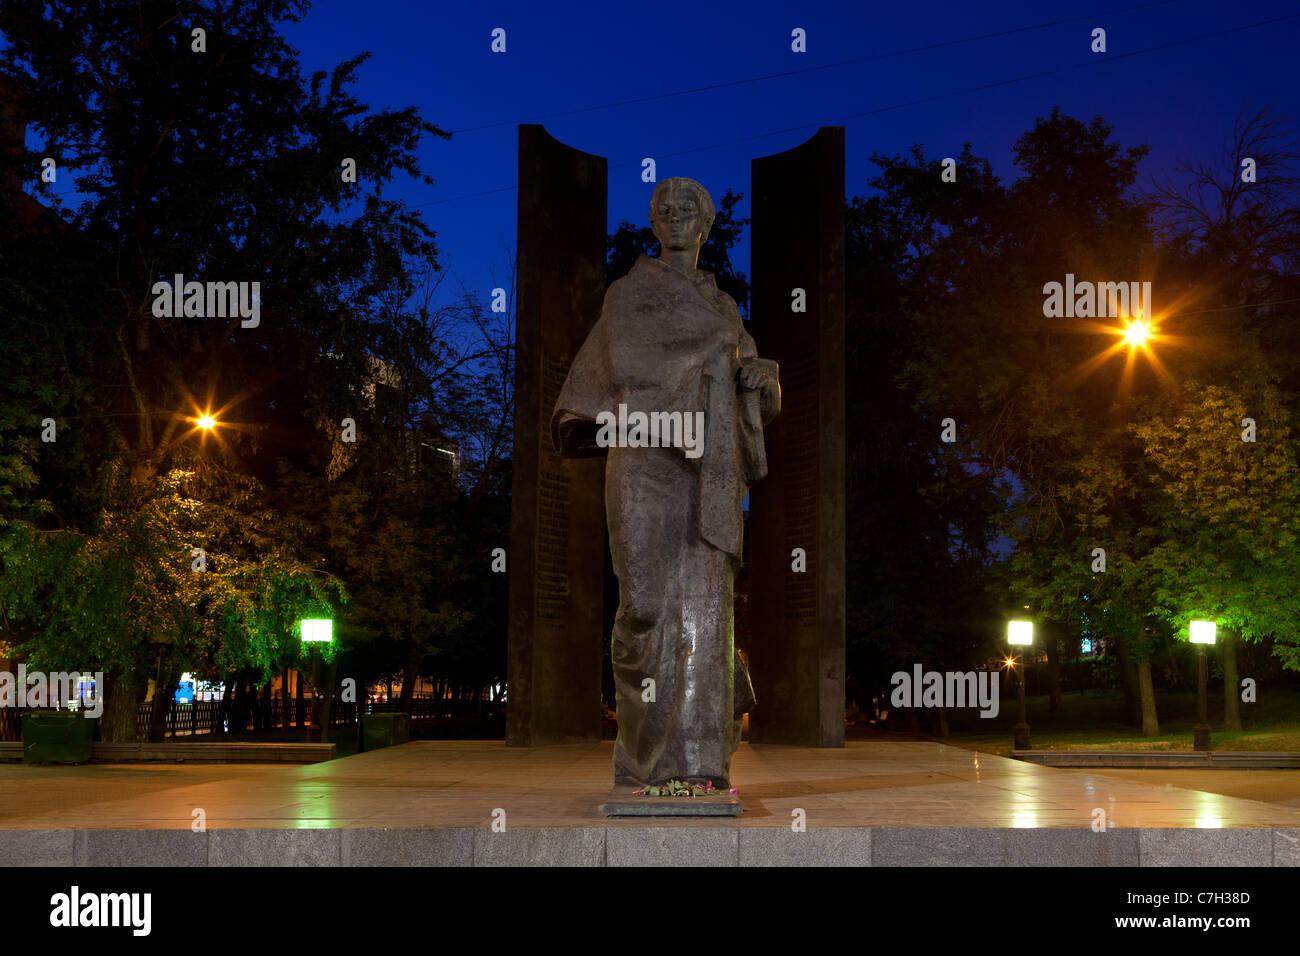 Monument to Vladimir Lenin's wife Nadezhda Krupskaya (1869-1939) in Moscow, Russia - Stock Image